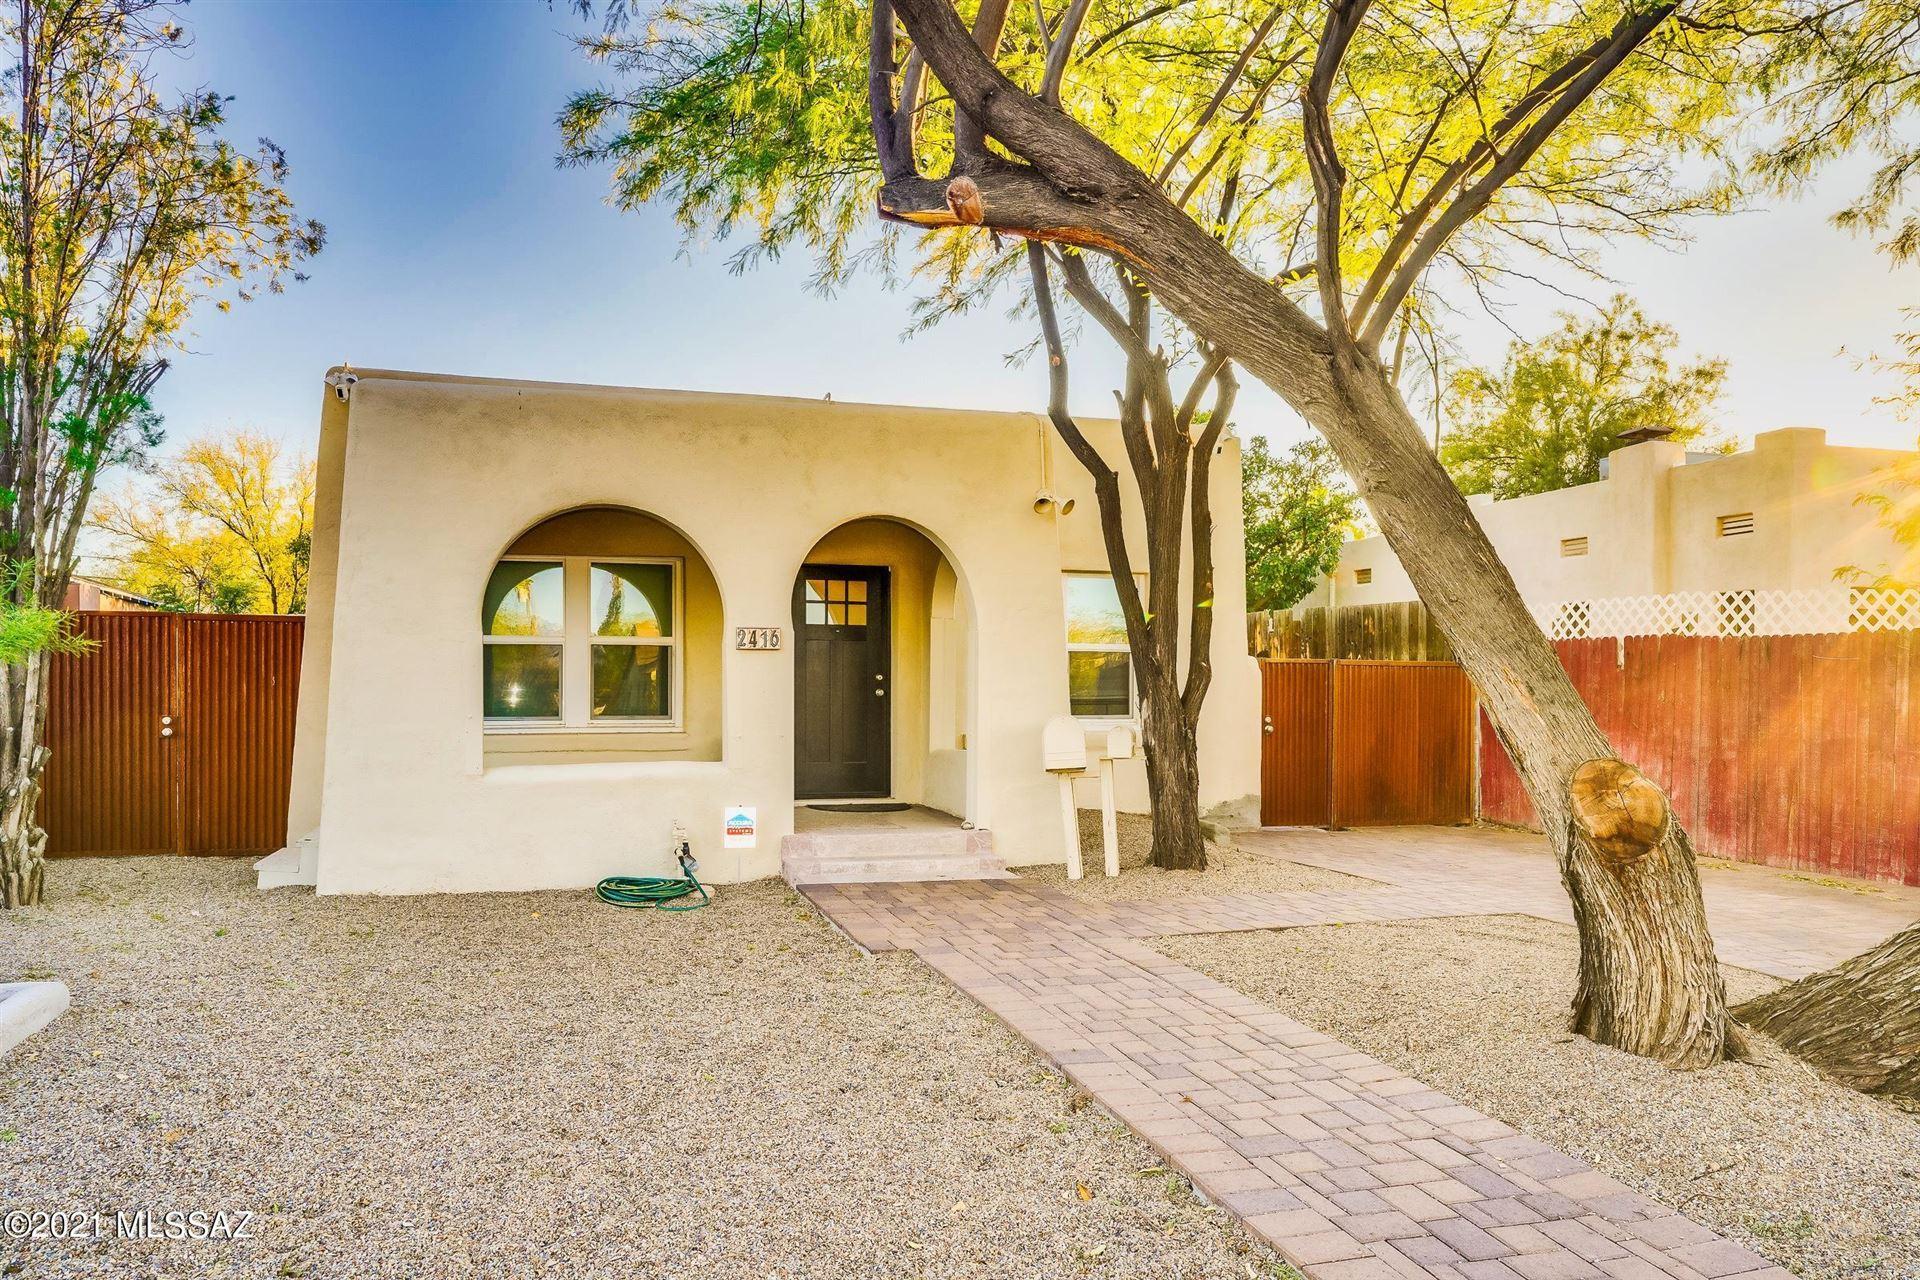 2416 E Drachman Street, Tucson, AZ 85719 - MLS#: 22113007